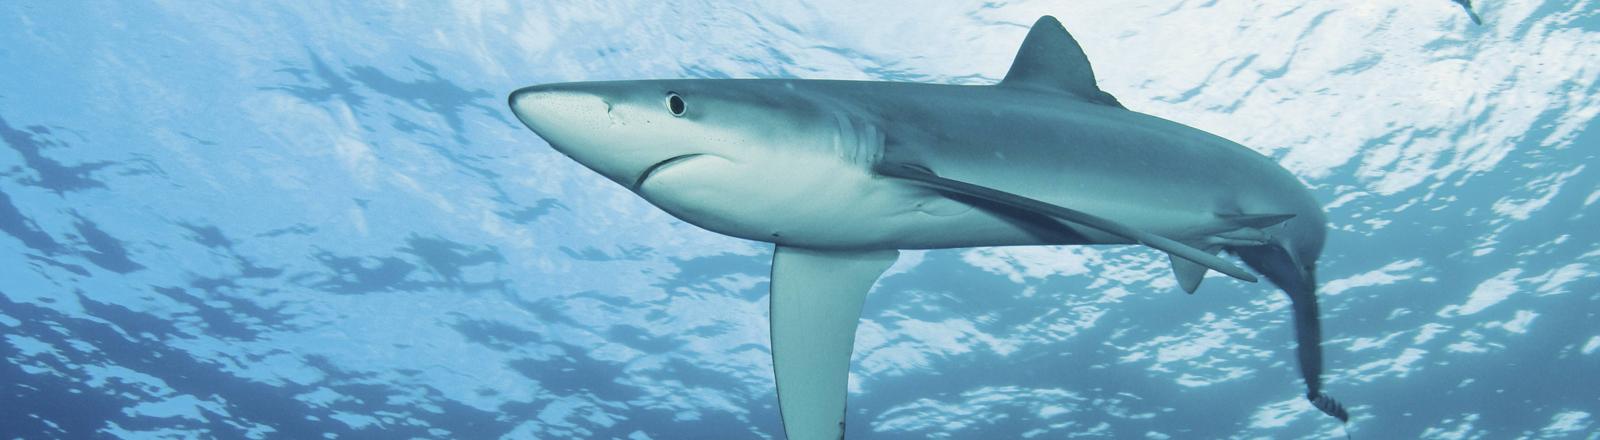 Blauhai im Meer